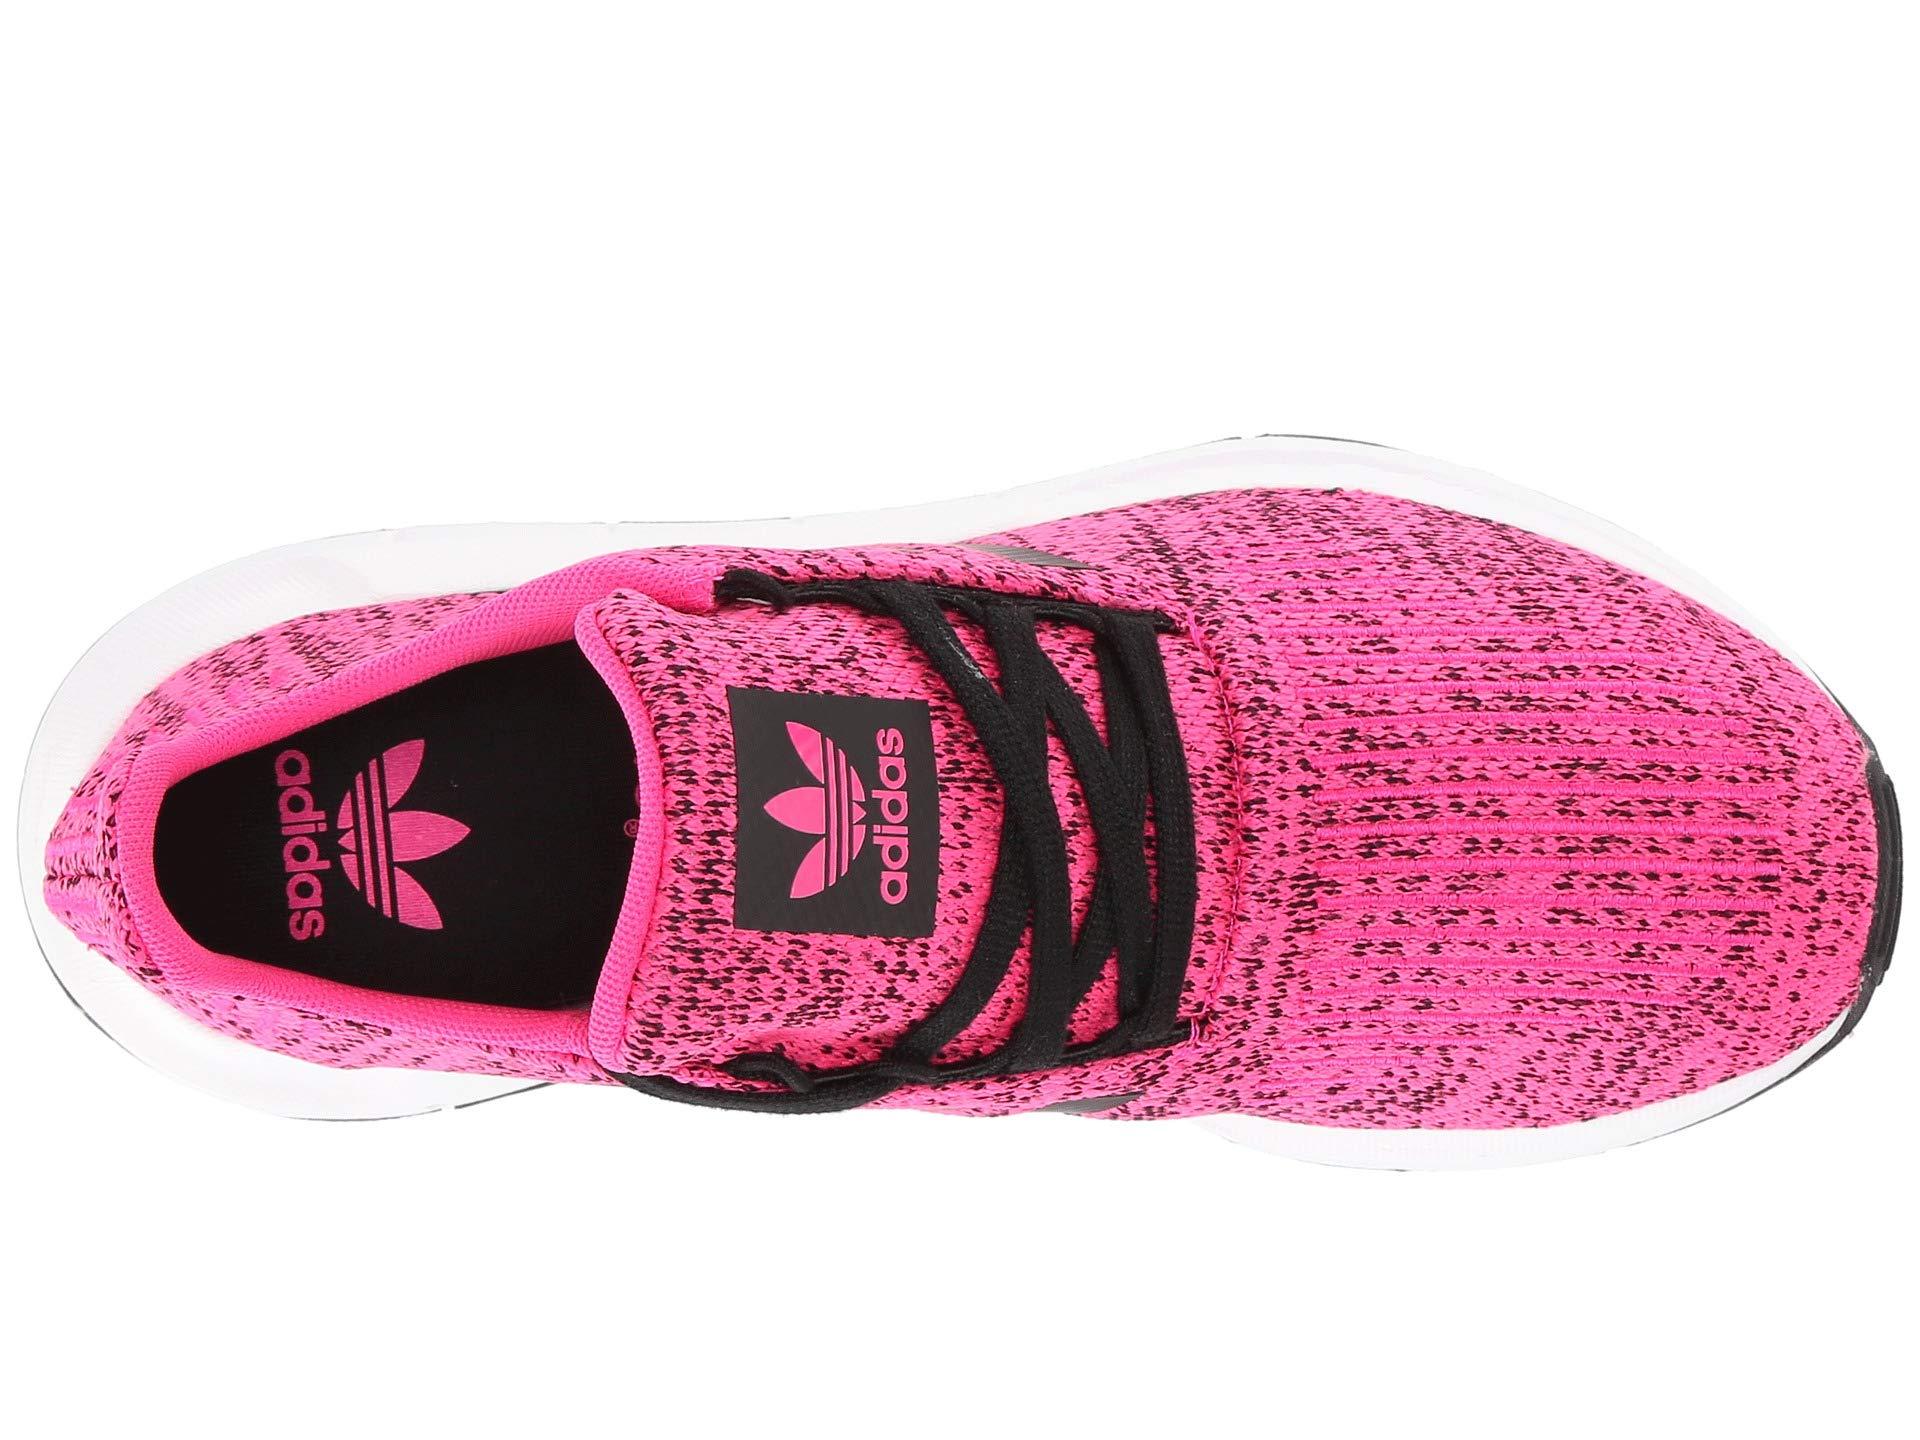 adidas Originals Kids Girl's Swift Run J (Big Kid) Shock Pink/Black 4.5 M US Big Kid by adidas Originals (Image #9)